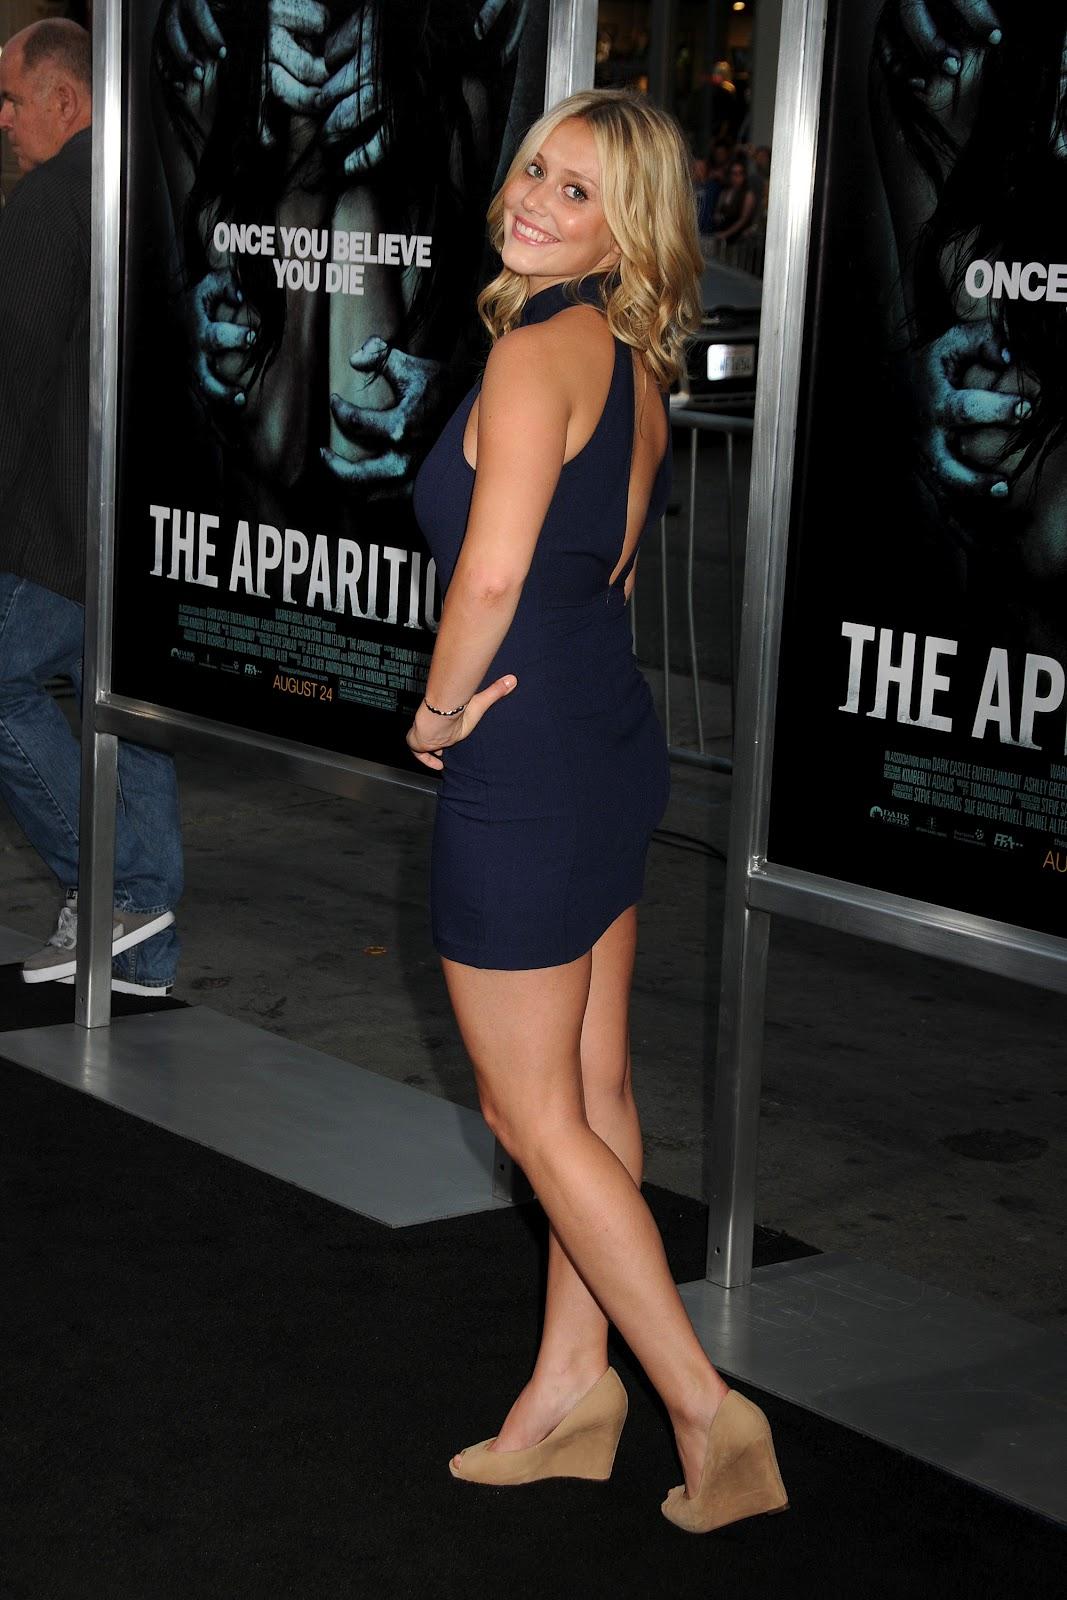 Julianna Guill at The Apparition Premiere - Sexy Leg Cross